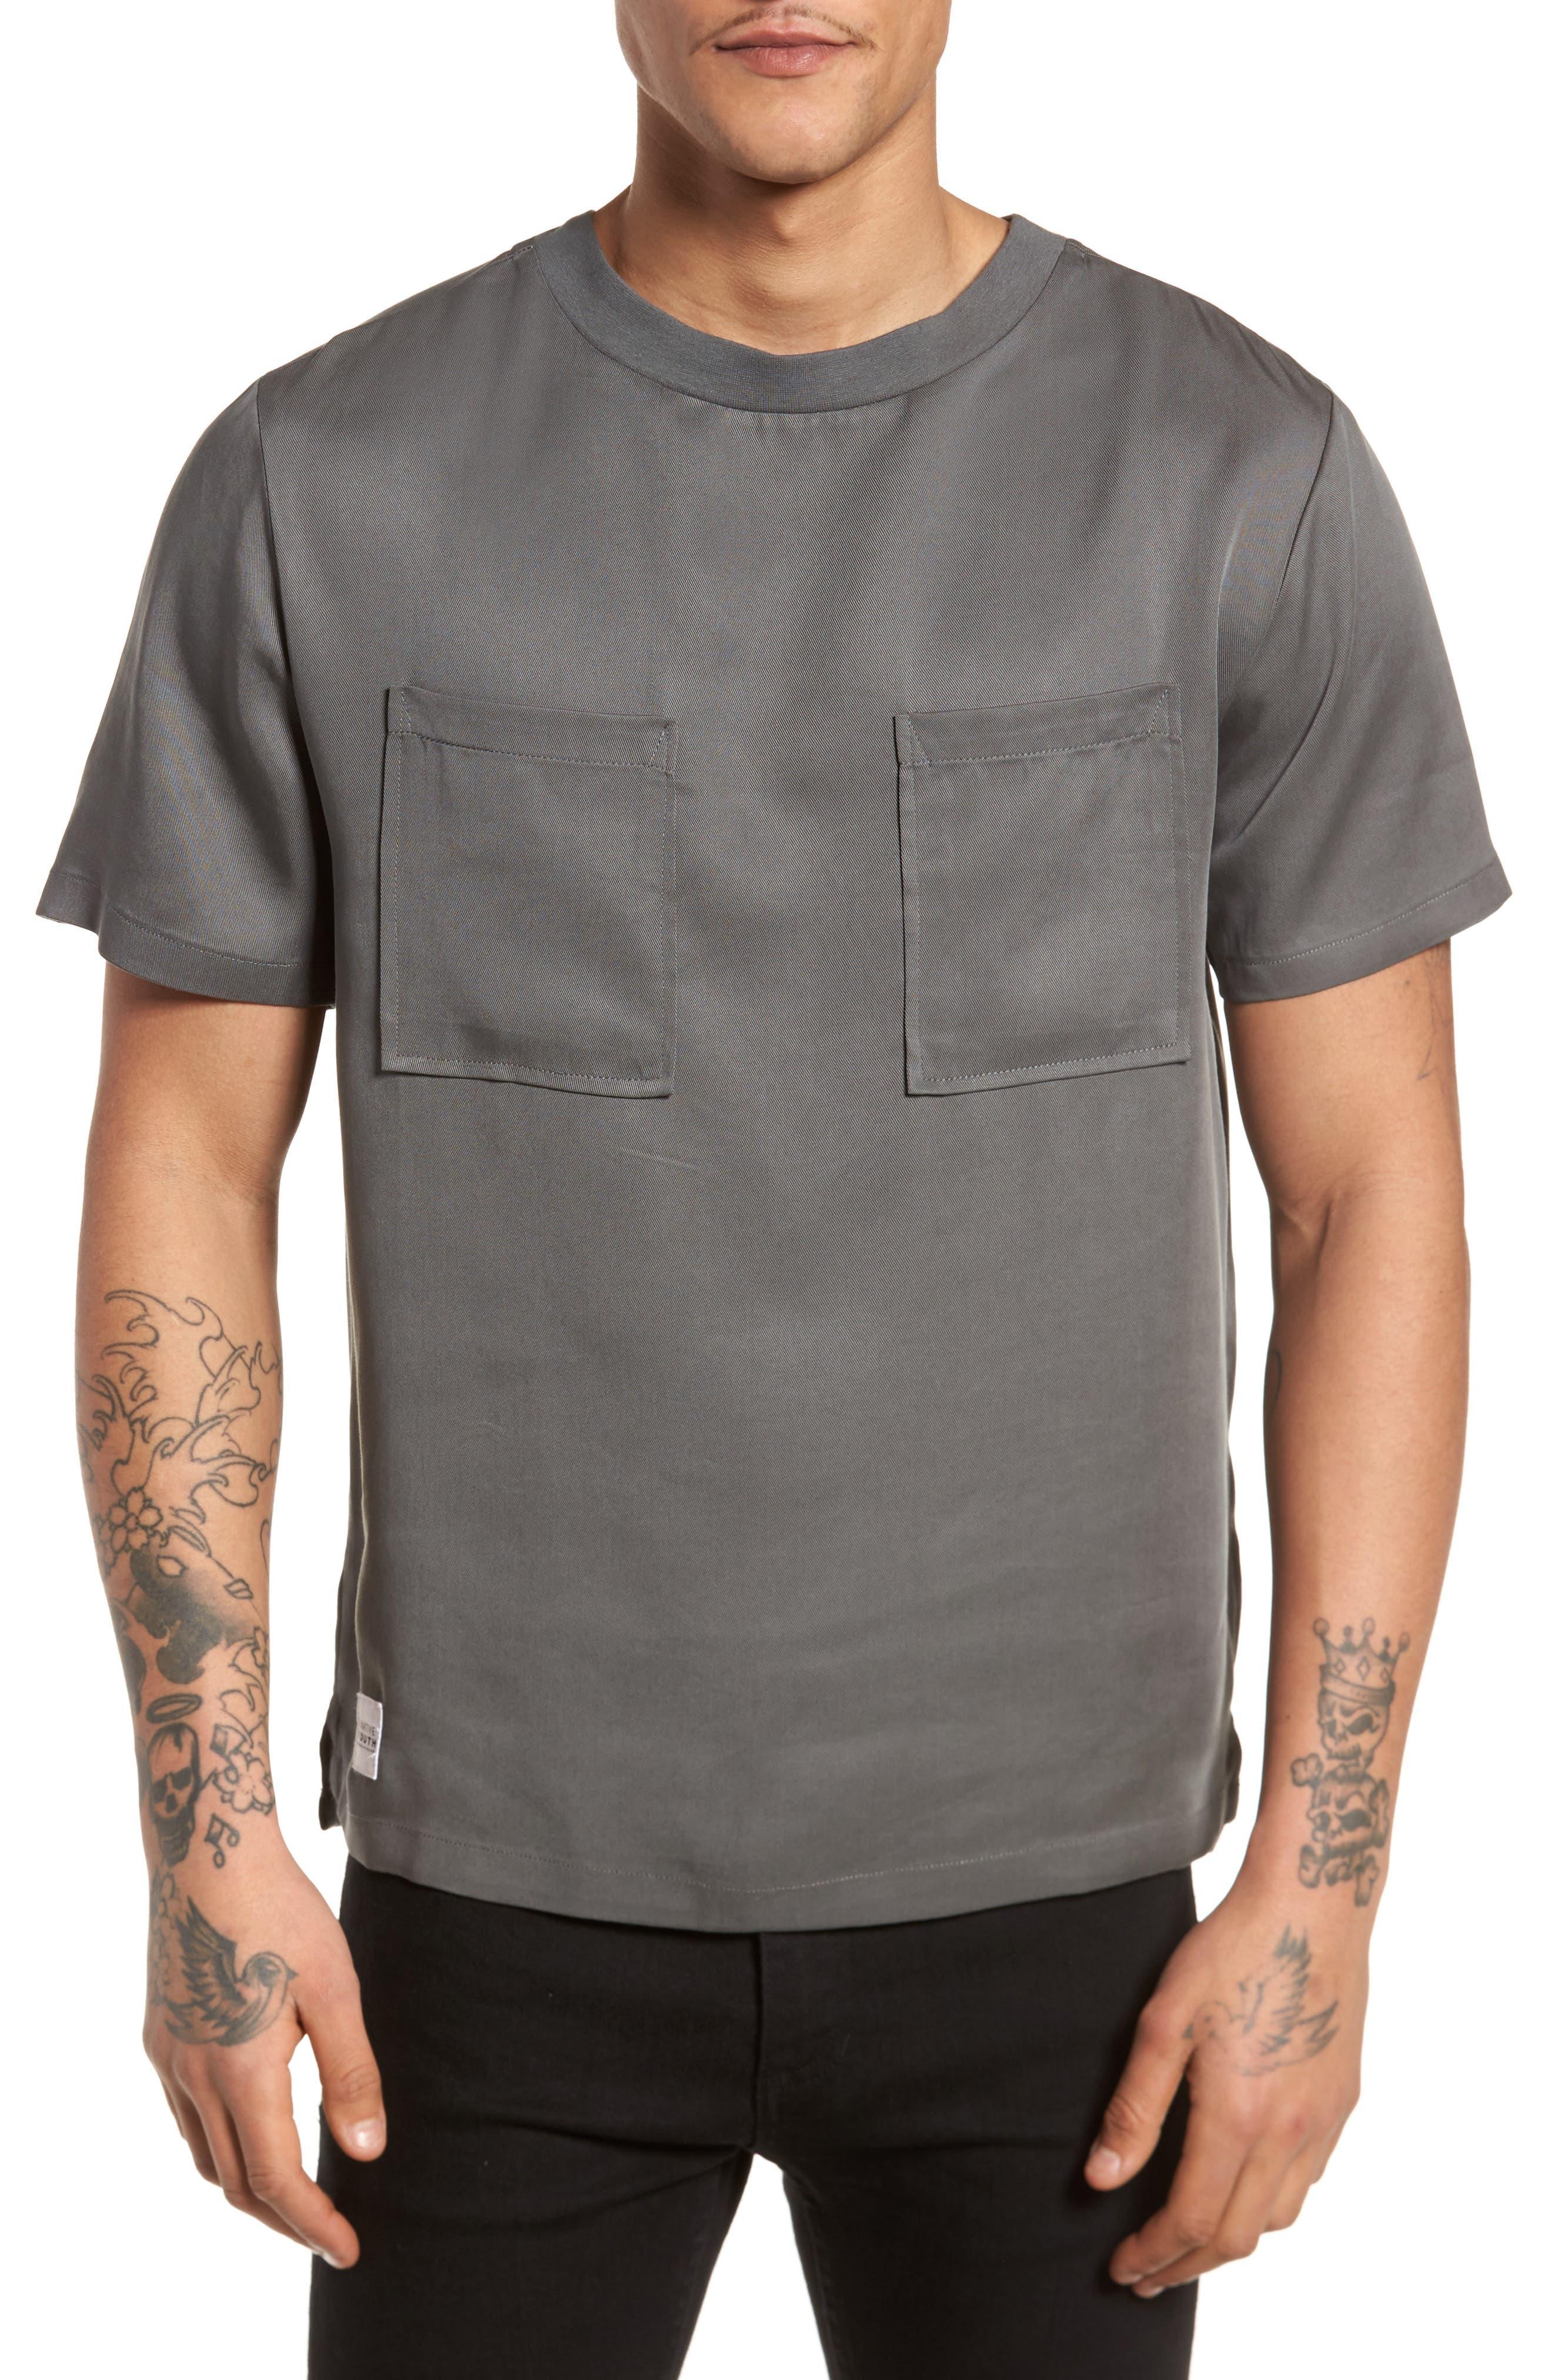 Denali Woven T-Shirt,                         Main,                         color, Grey